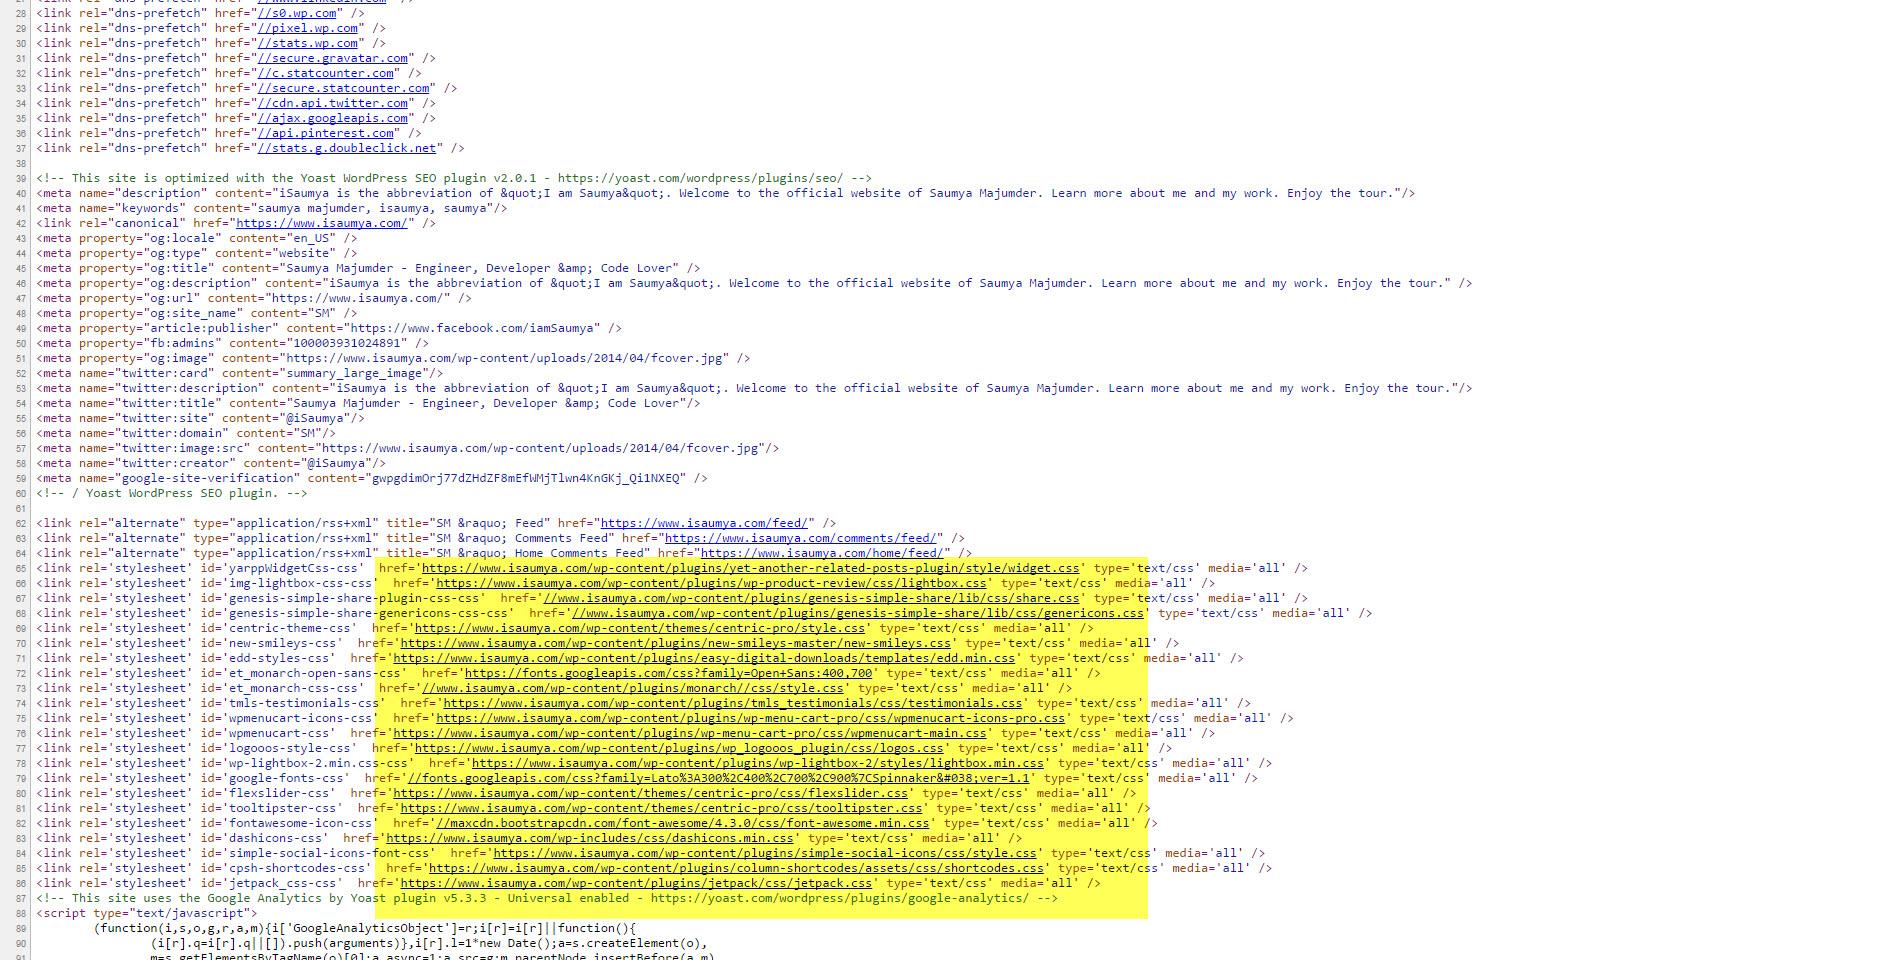 Frontend Source Code - HTML Compressor DISABLED